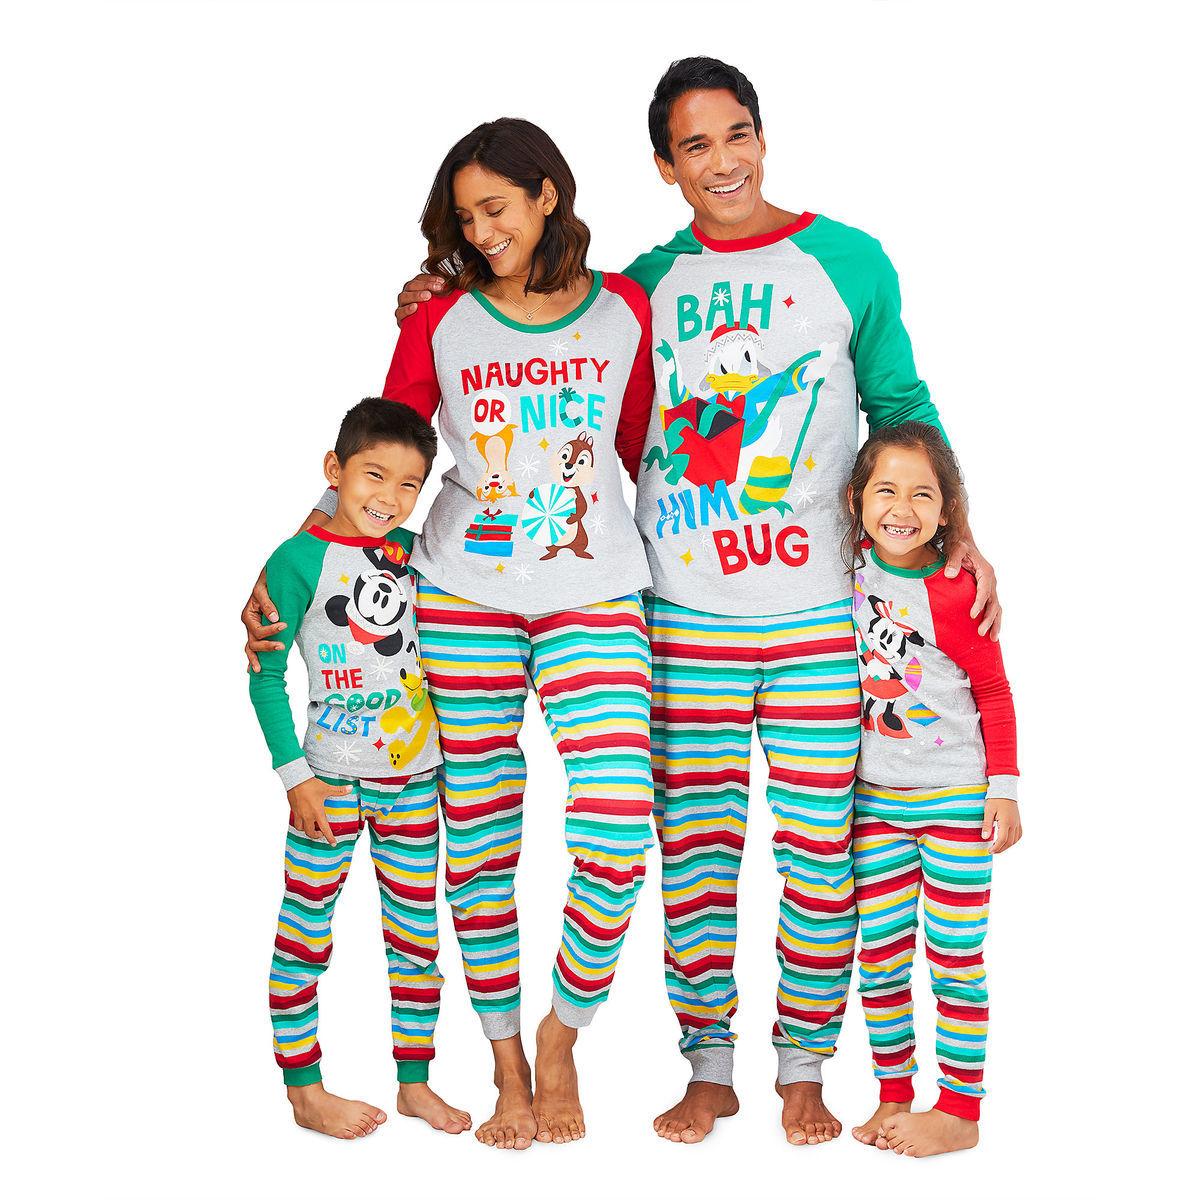 7ab9f6723e88 10 Photo-Worthy Matching Disney Pajamas for Christmas (Nov. 2018)